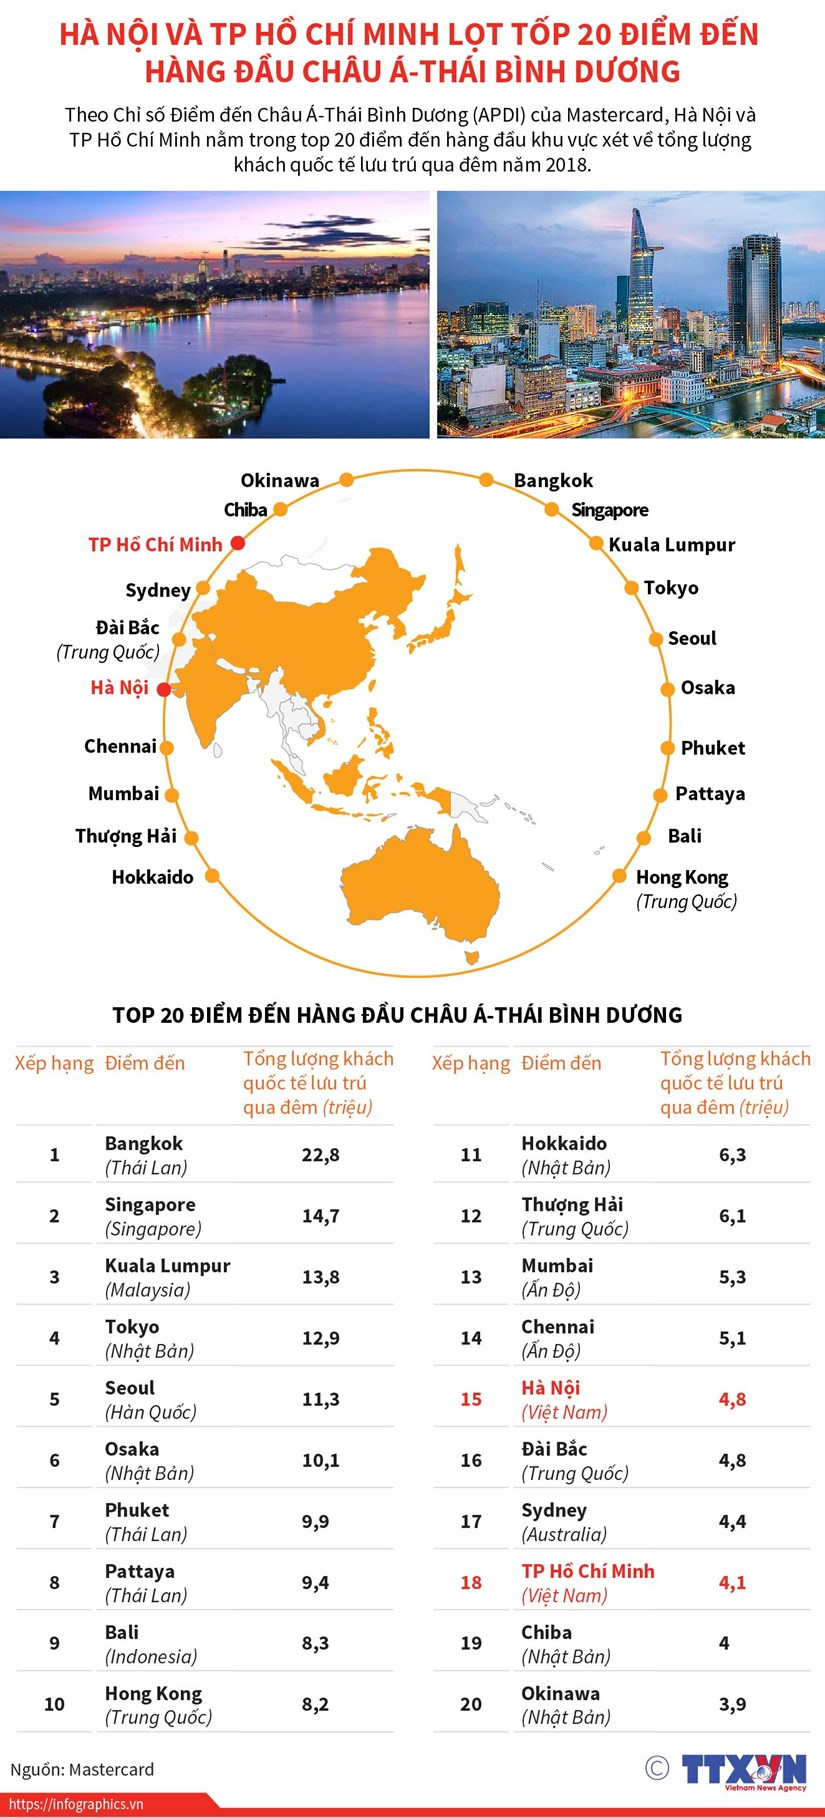 [Infographics] Ha Noi, TP.HCM lot top 20 diem den hang dau chau A-TBD hinh anh 1